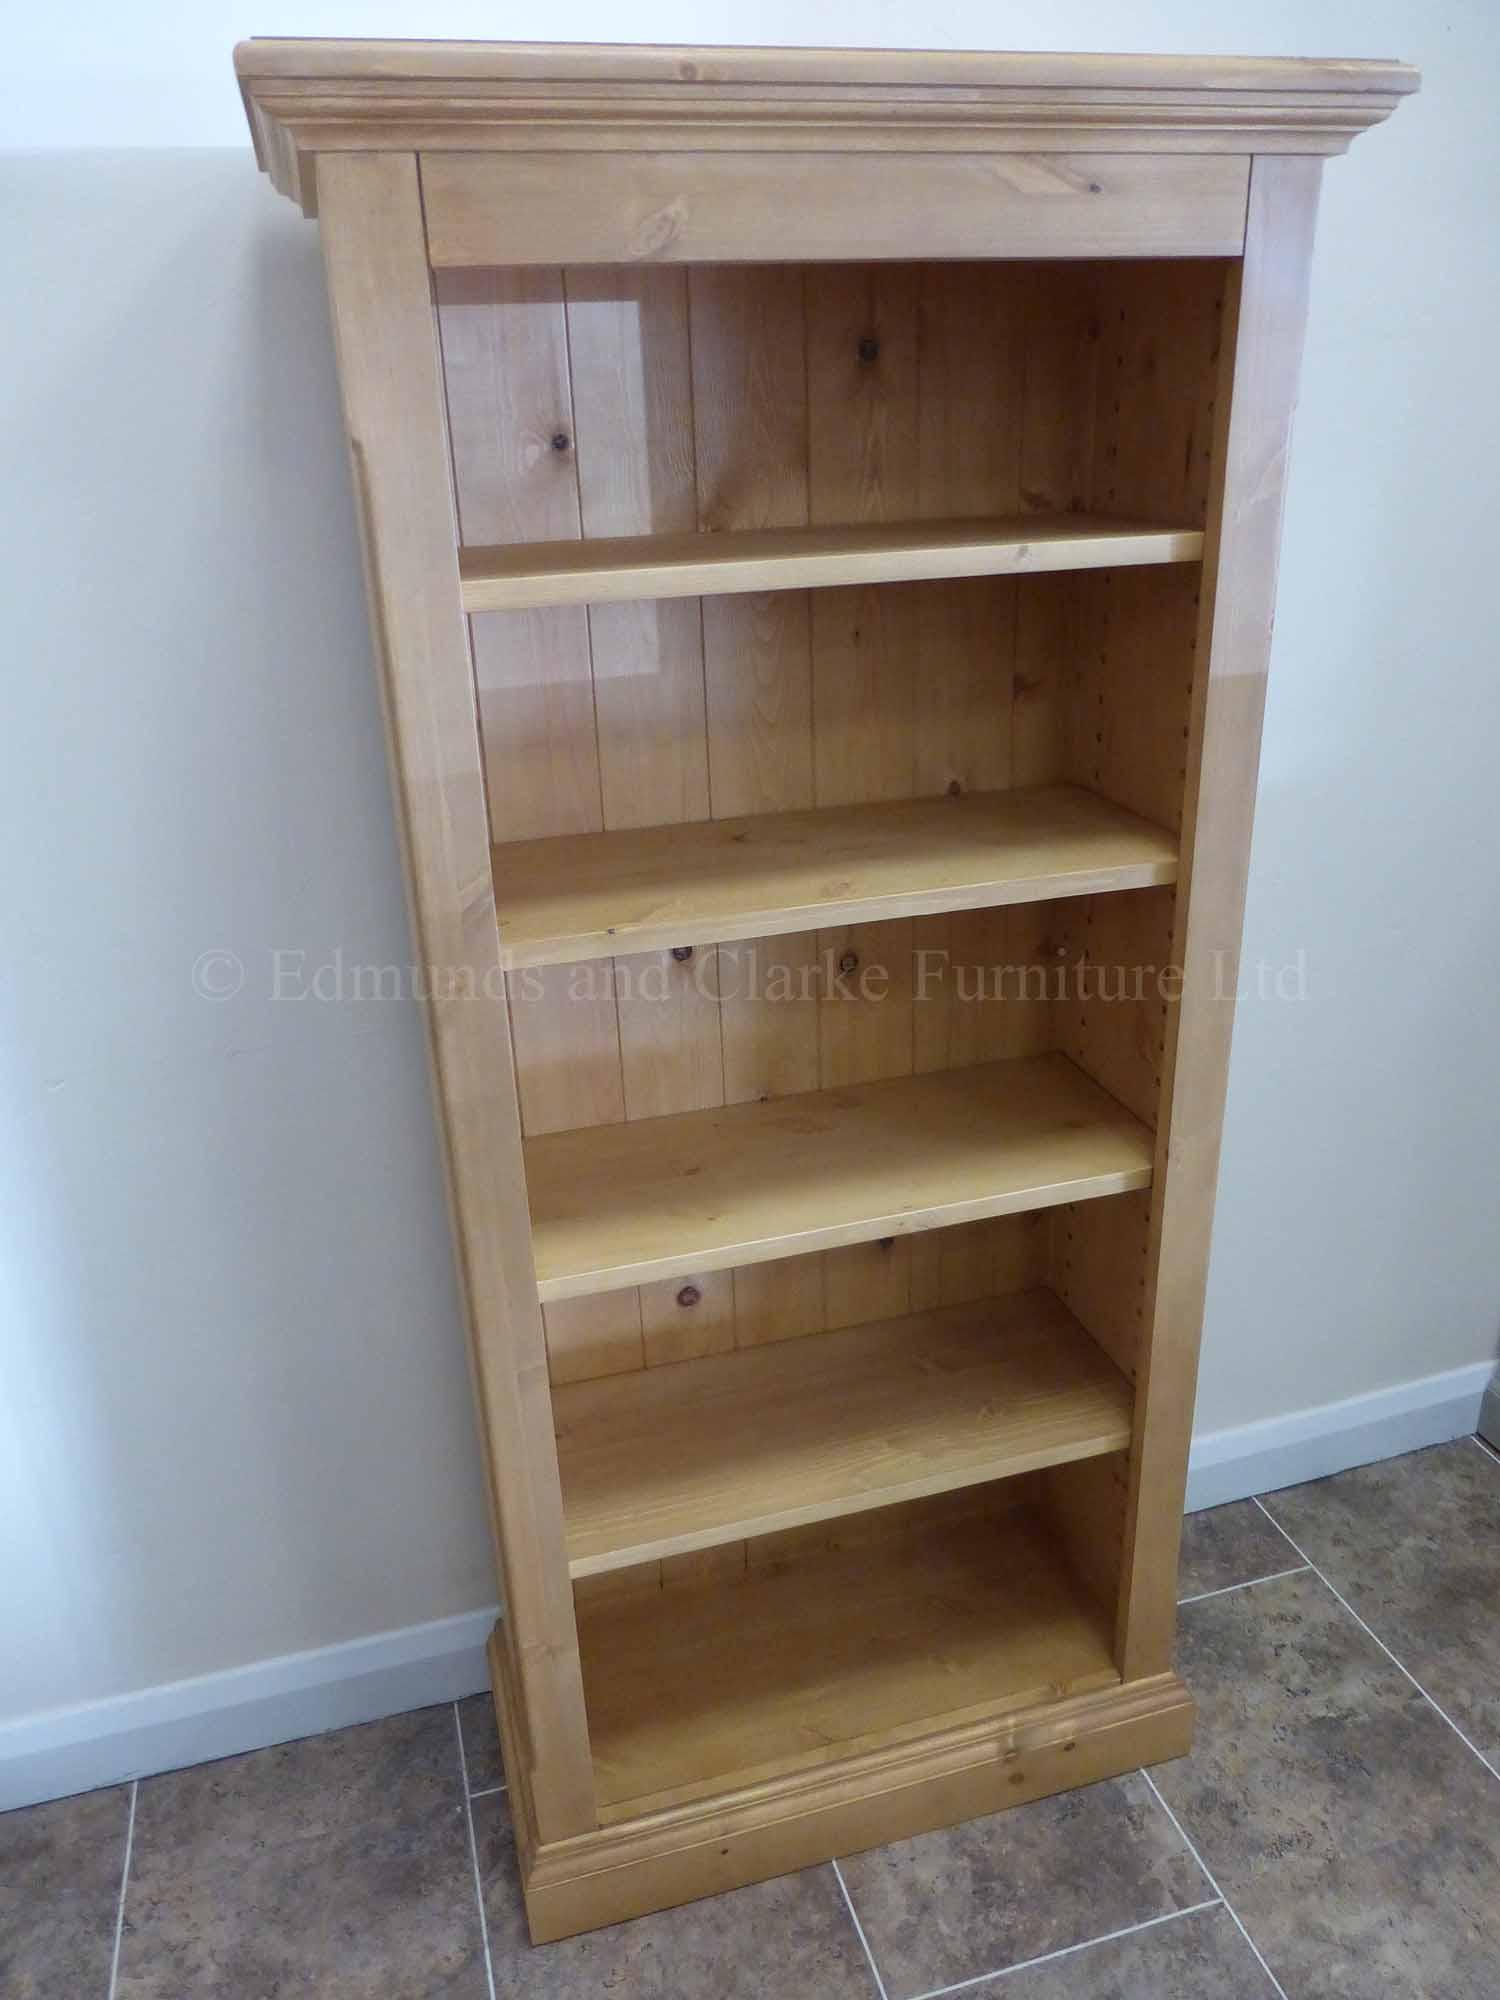 Edmunds slim narrow pine waxed bookcase